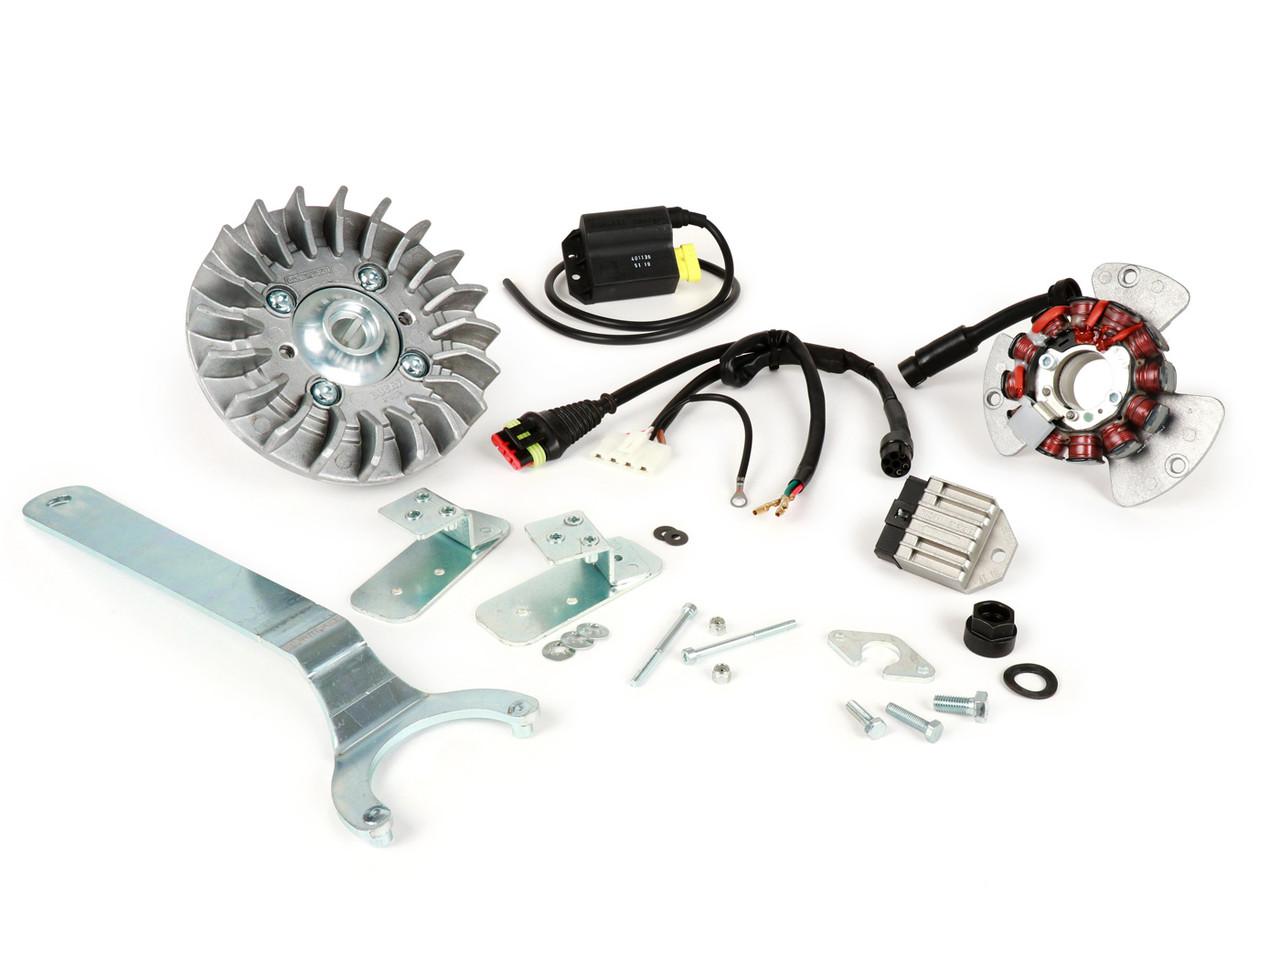 Lambretta Ignition Kit AC Sport Ducati CasaTronic Casa Pro - 2.2kg GP (DW-CLX903)